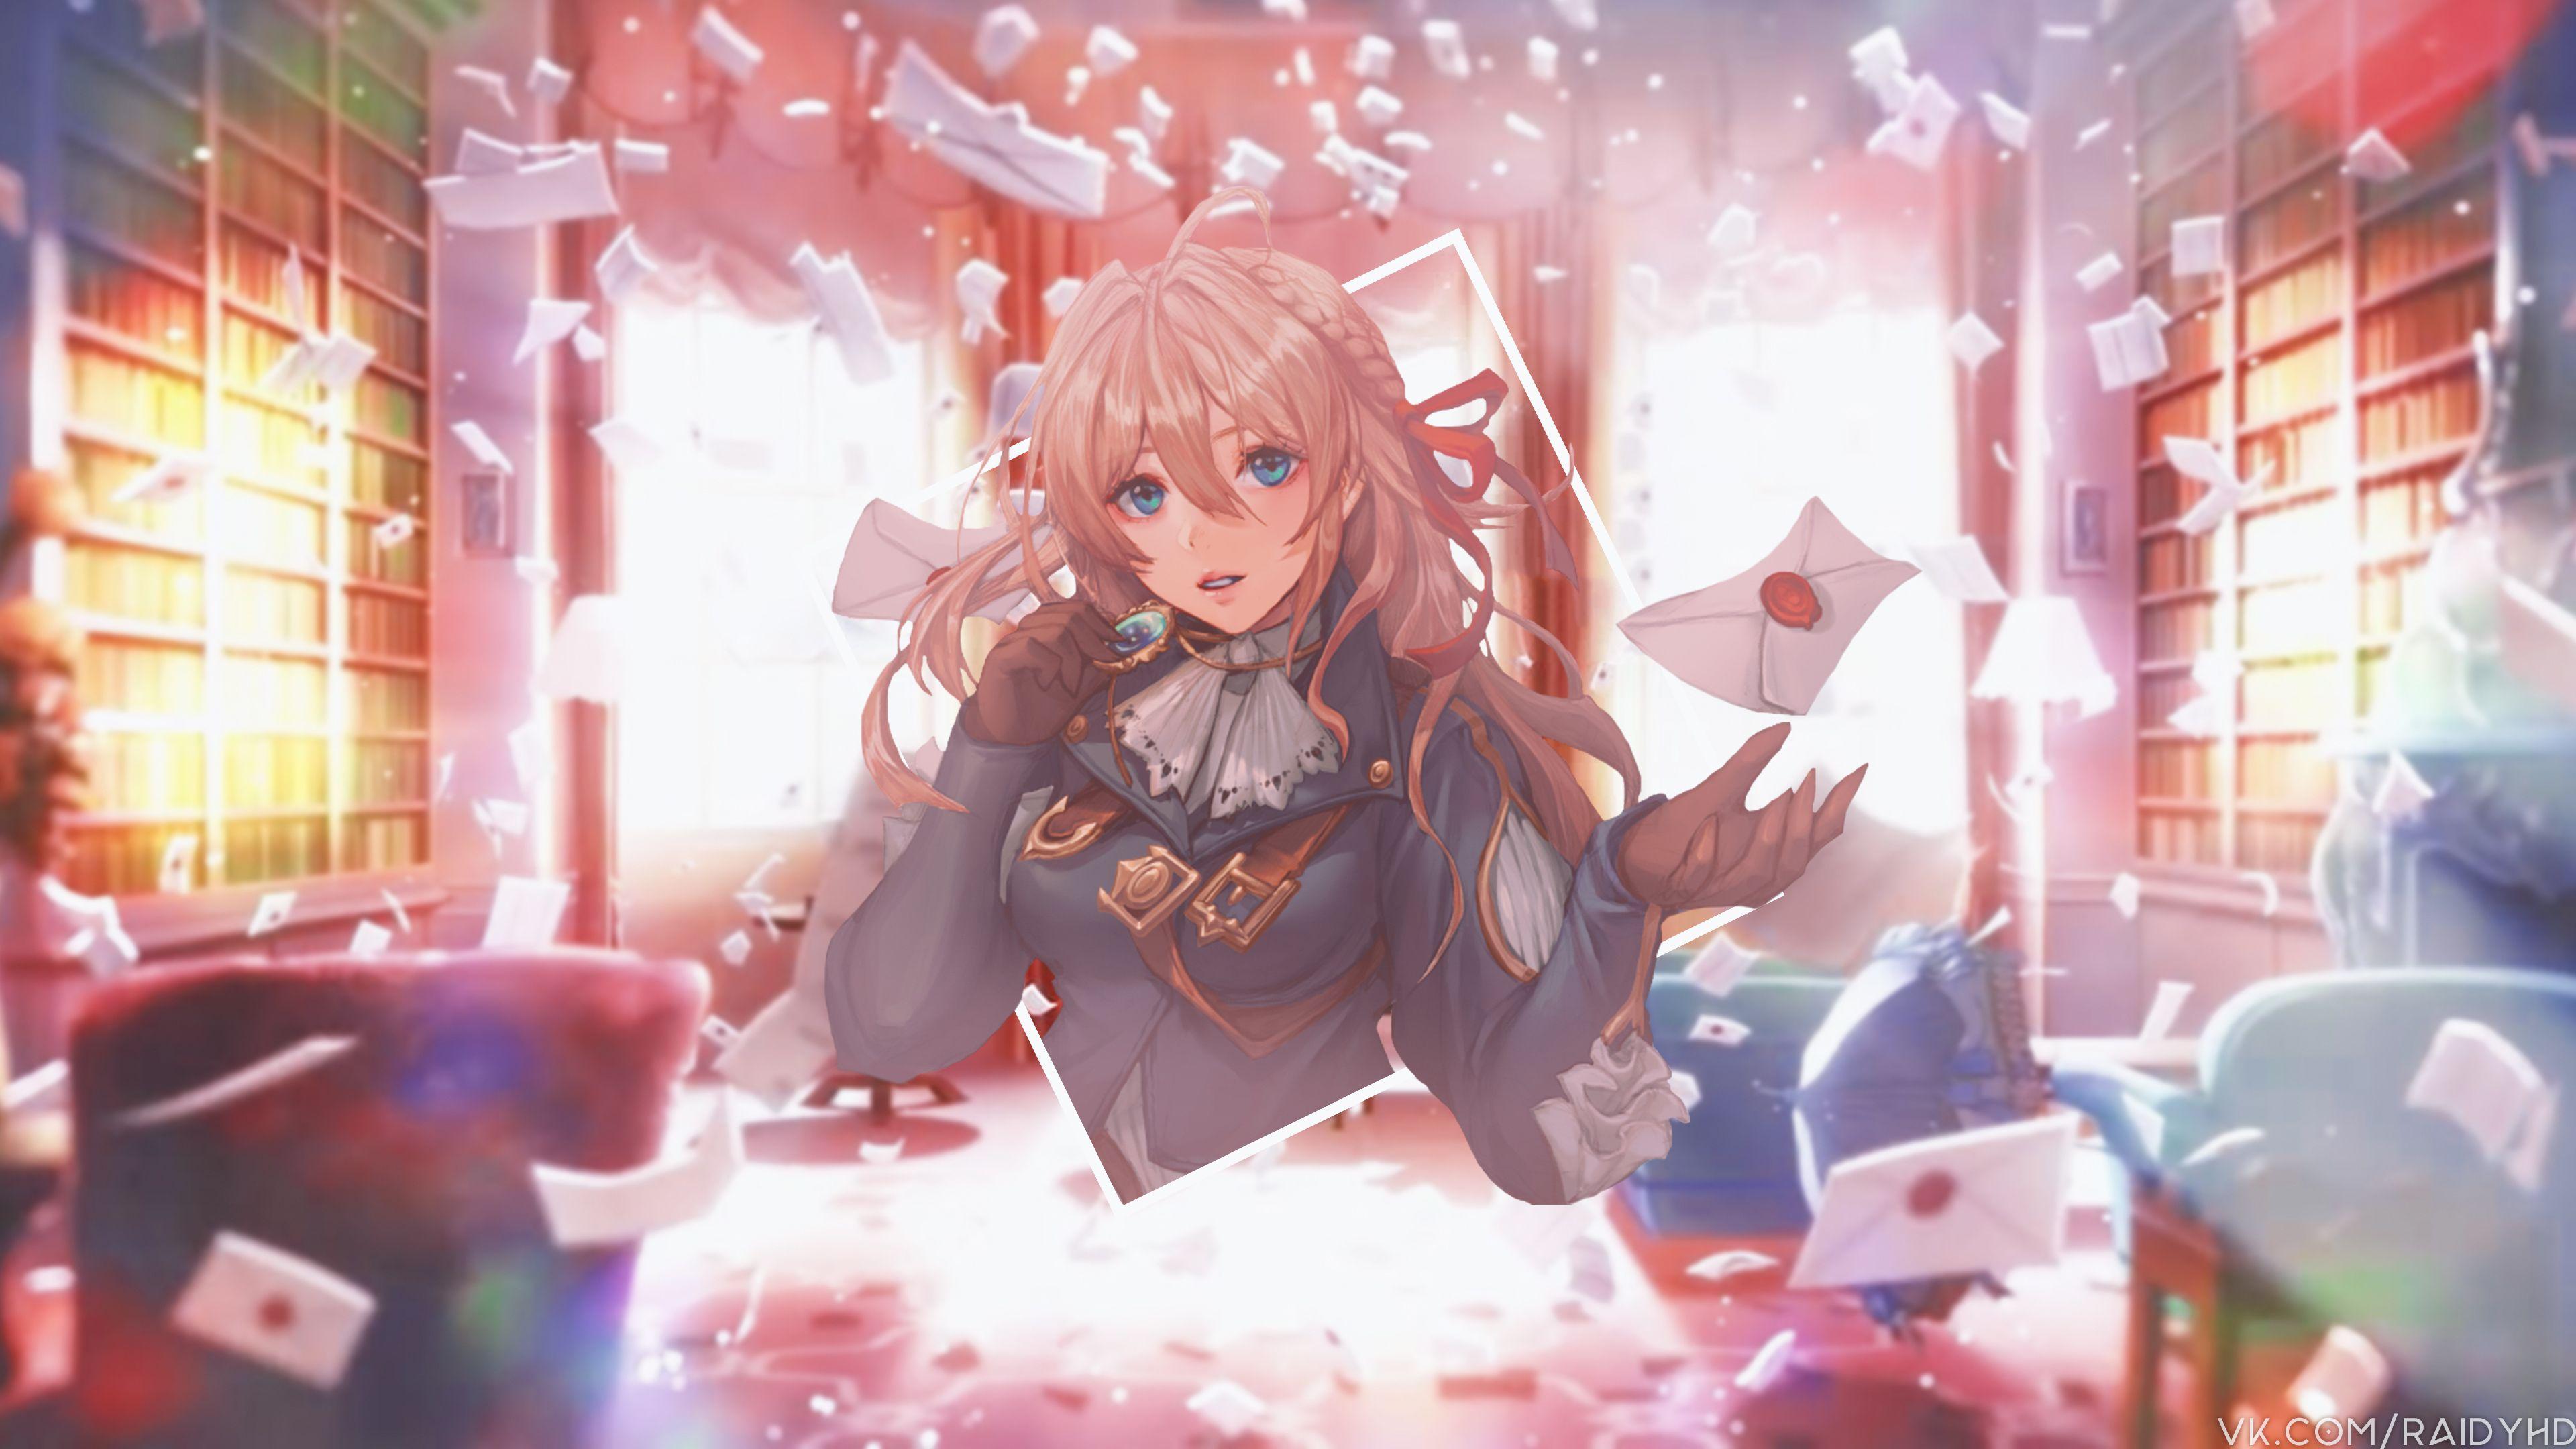 4k Violet Evergarden Anime Violet Evergarden Wallpapers Hd